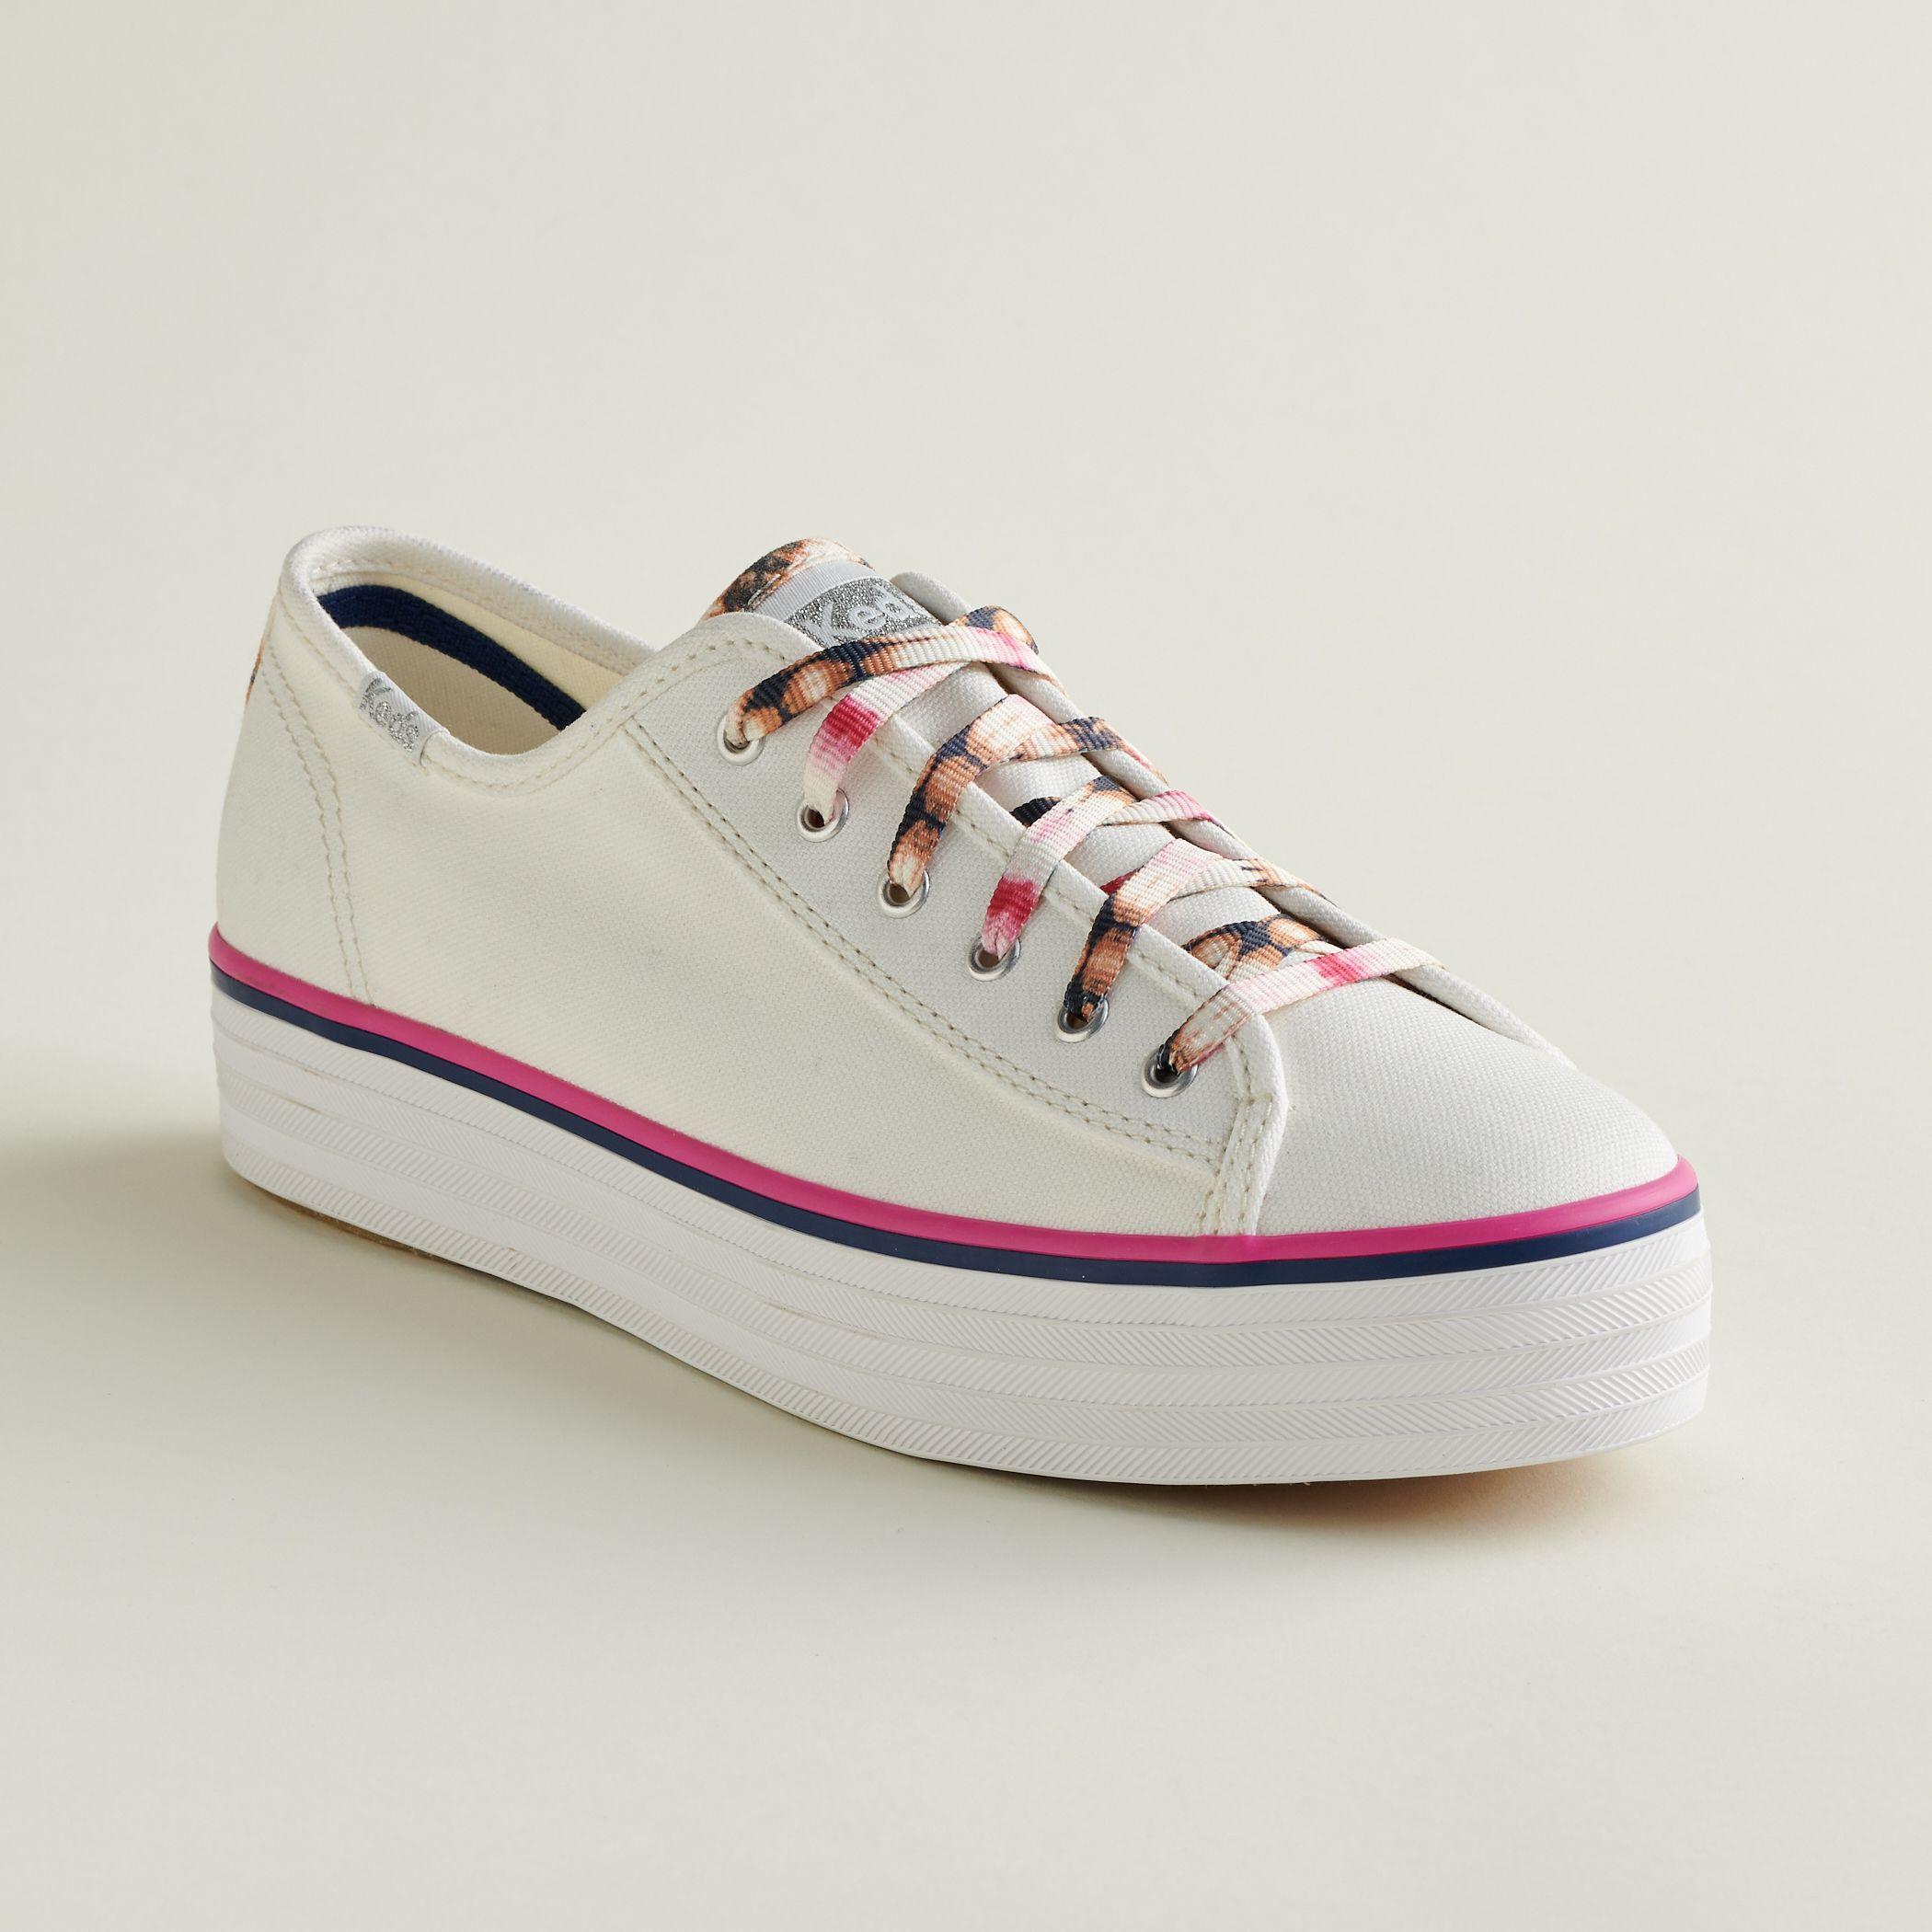 kohls womens keds tennis shoes 6pm